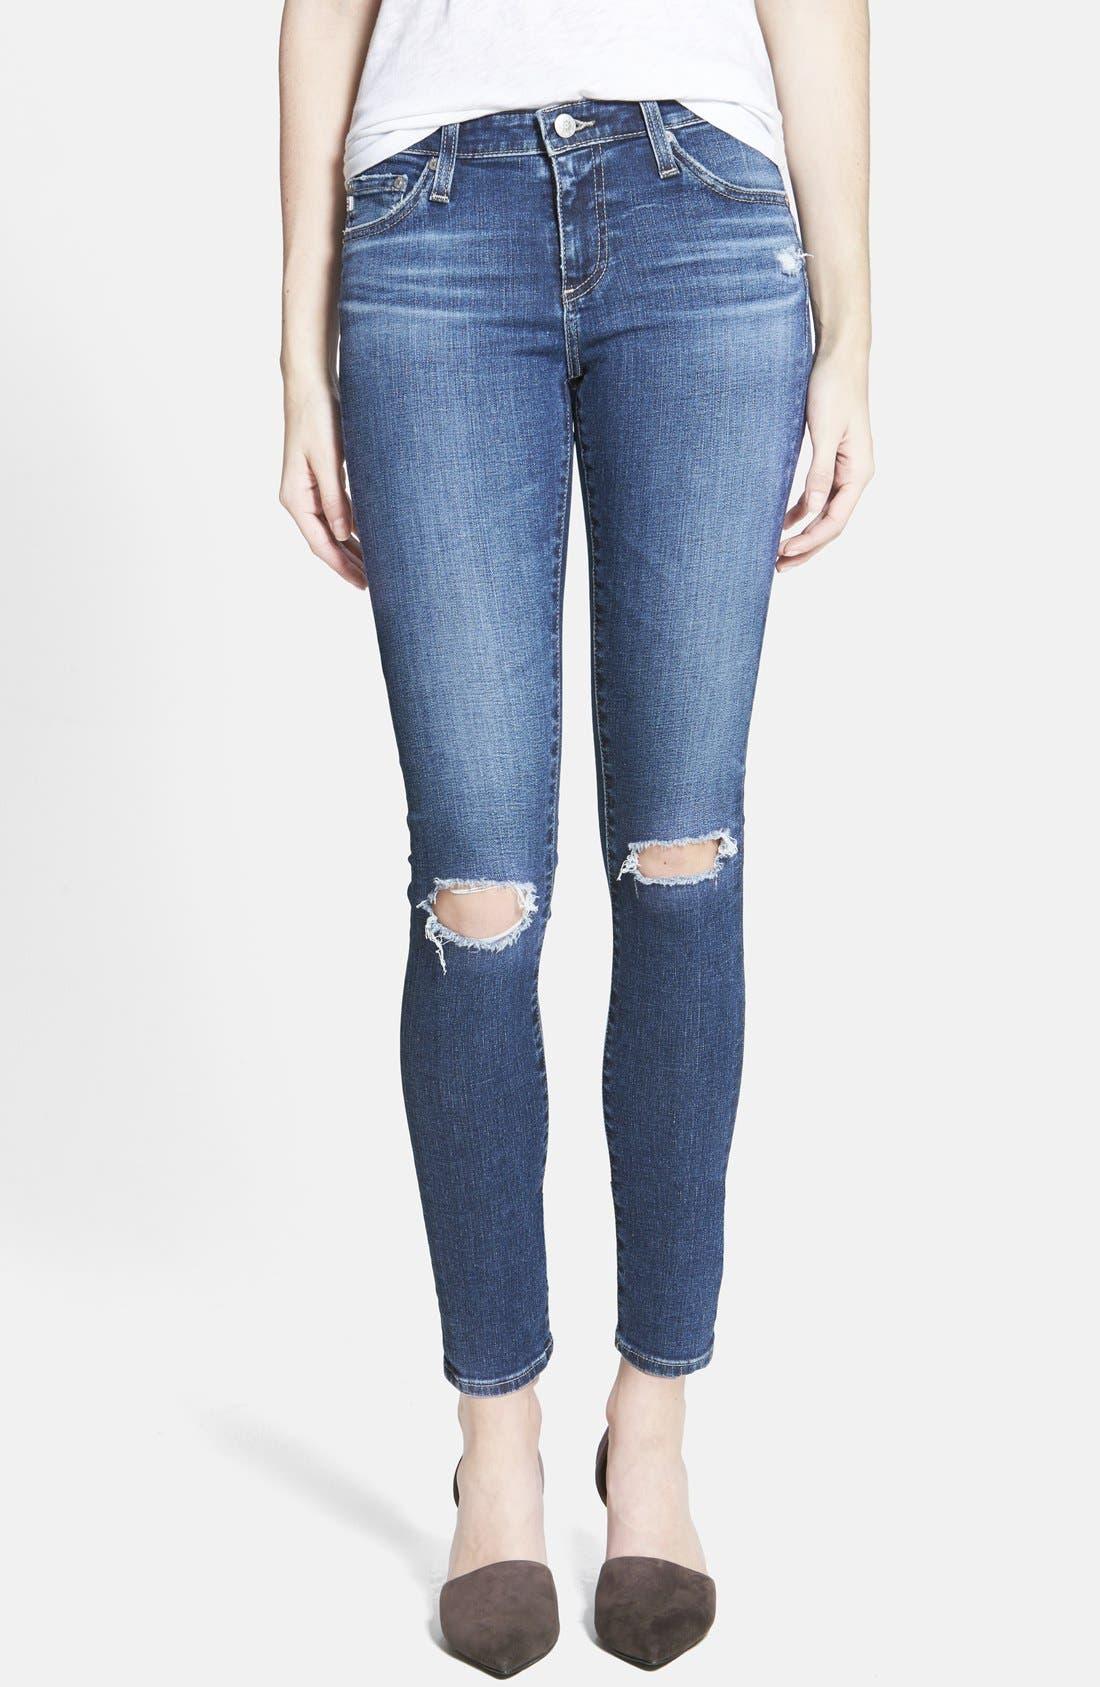 Alternate Image 1 Selected - Alexa Chung for AG 'The Legging' Ankle Jeans (11 Year Dreamer)